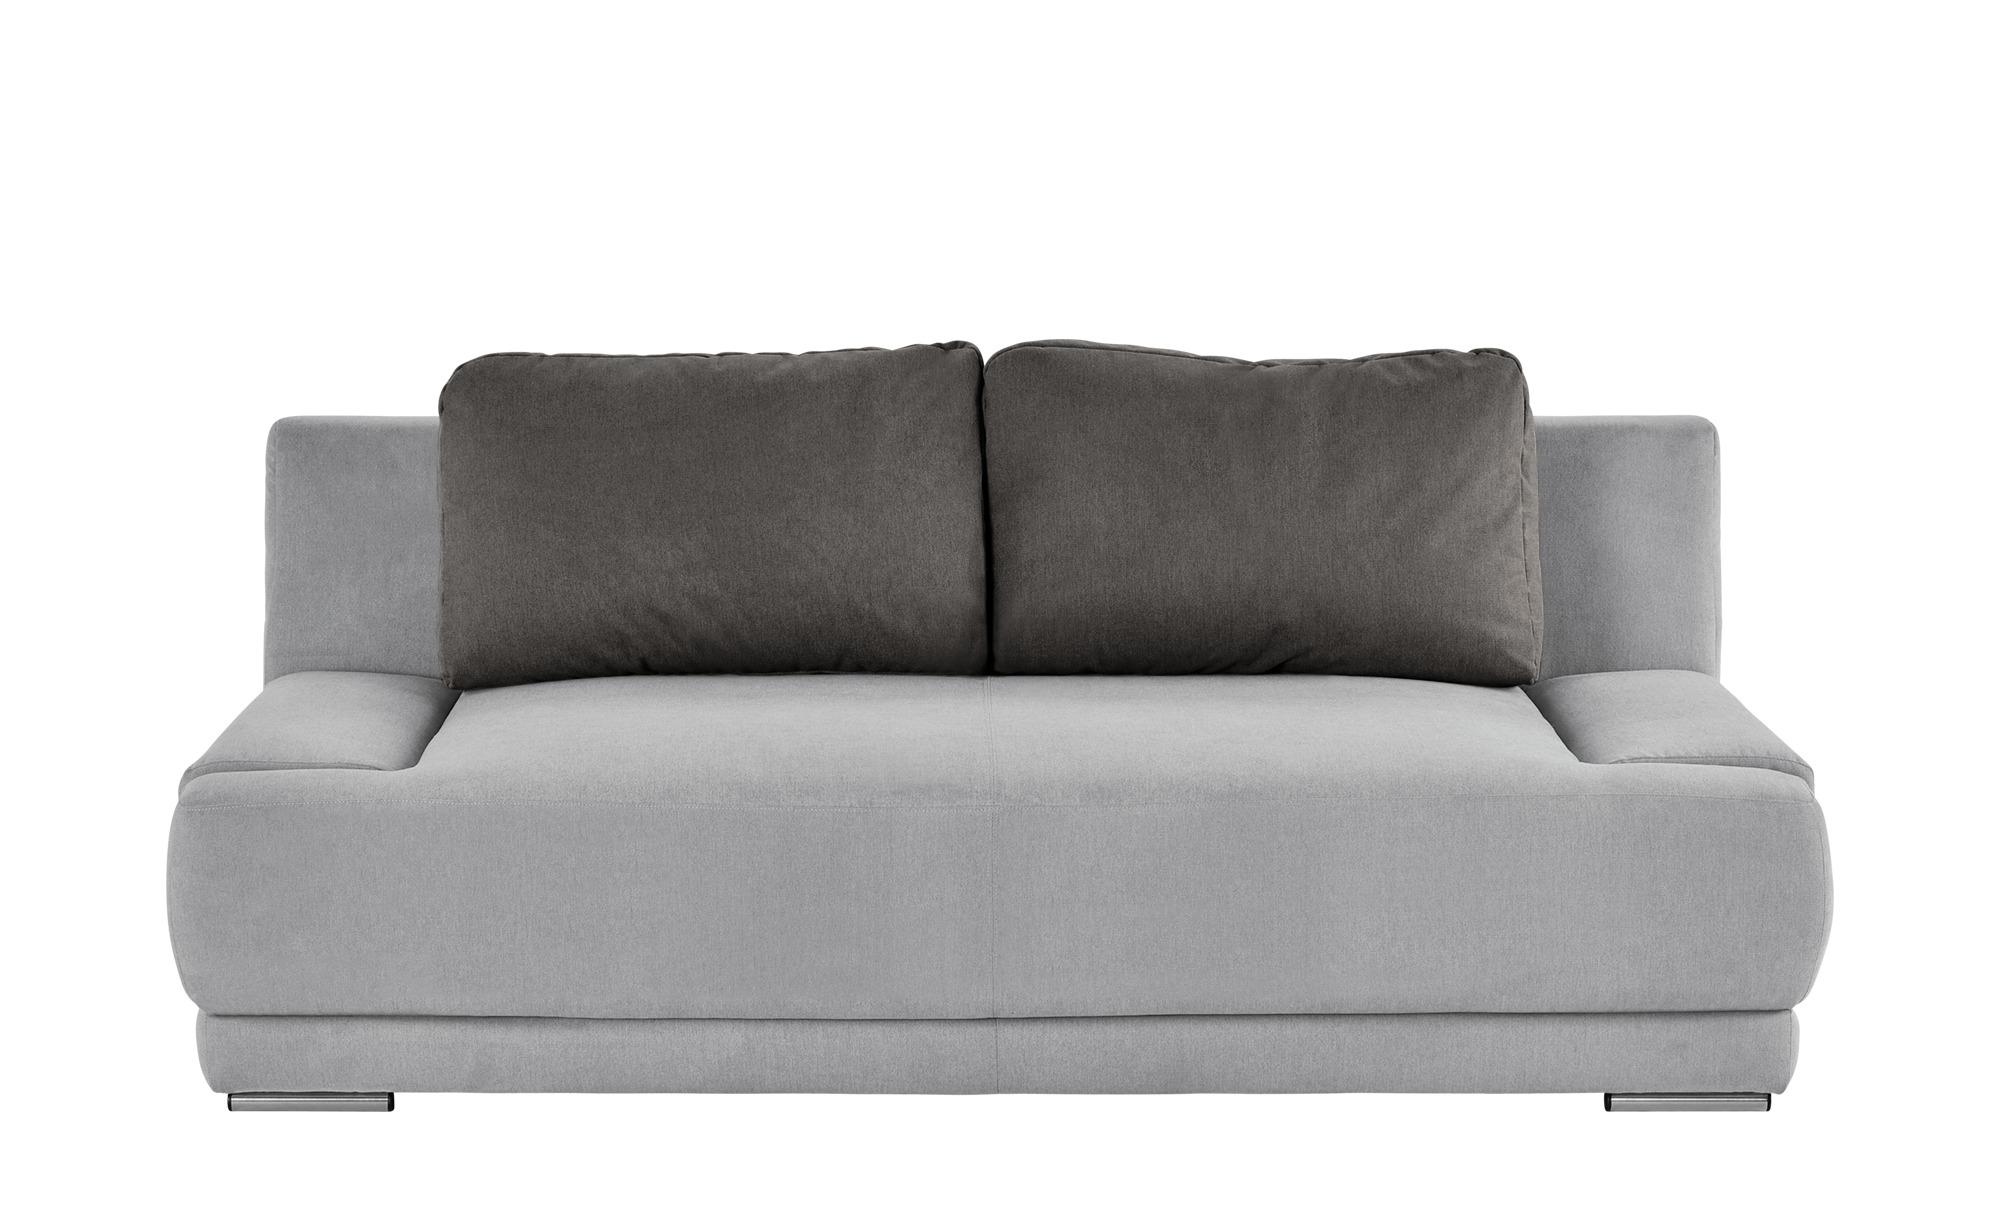 smart Schlafsofa grau/braun - Flachgewebe Regina ¦ grau ¦ Maße (cm): B: 206 H: 83 T: 98 Polstermöbel > Sofas > 2-Sitzer - Höffner